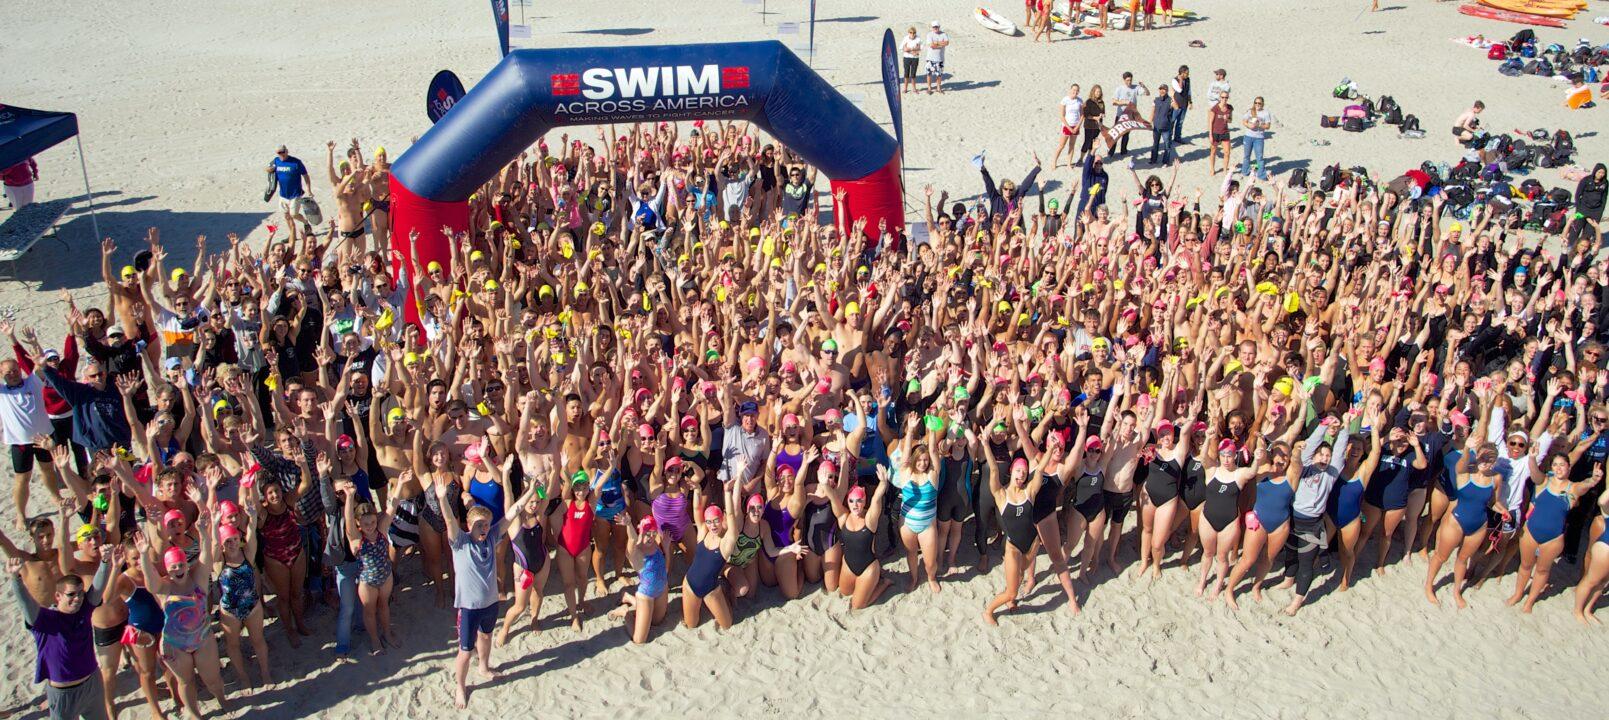 'WaveMakers' Docu-Series about Swim Across America Premieres July 8